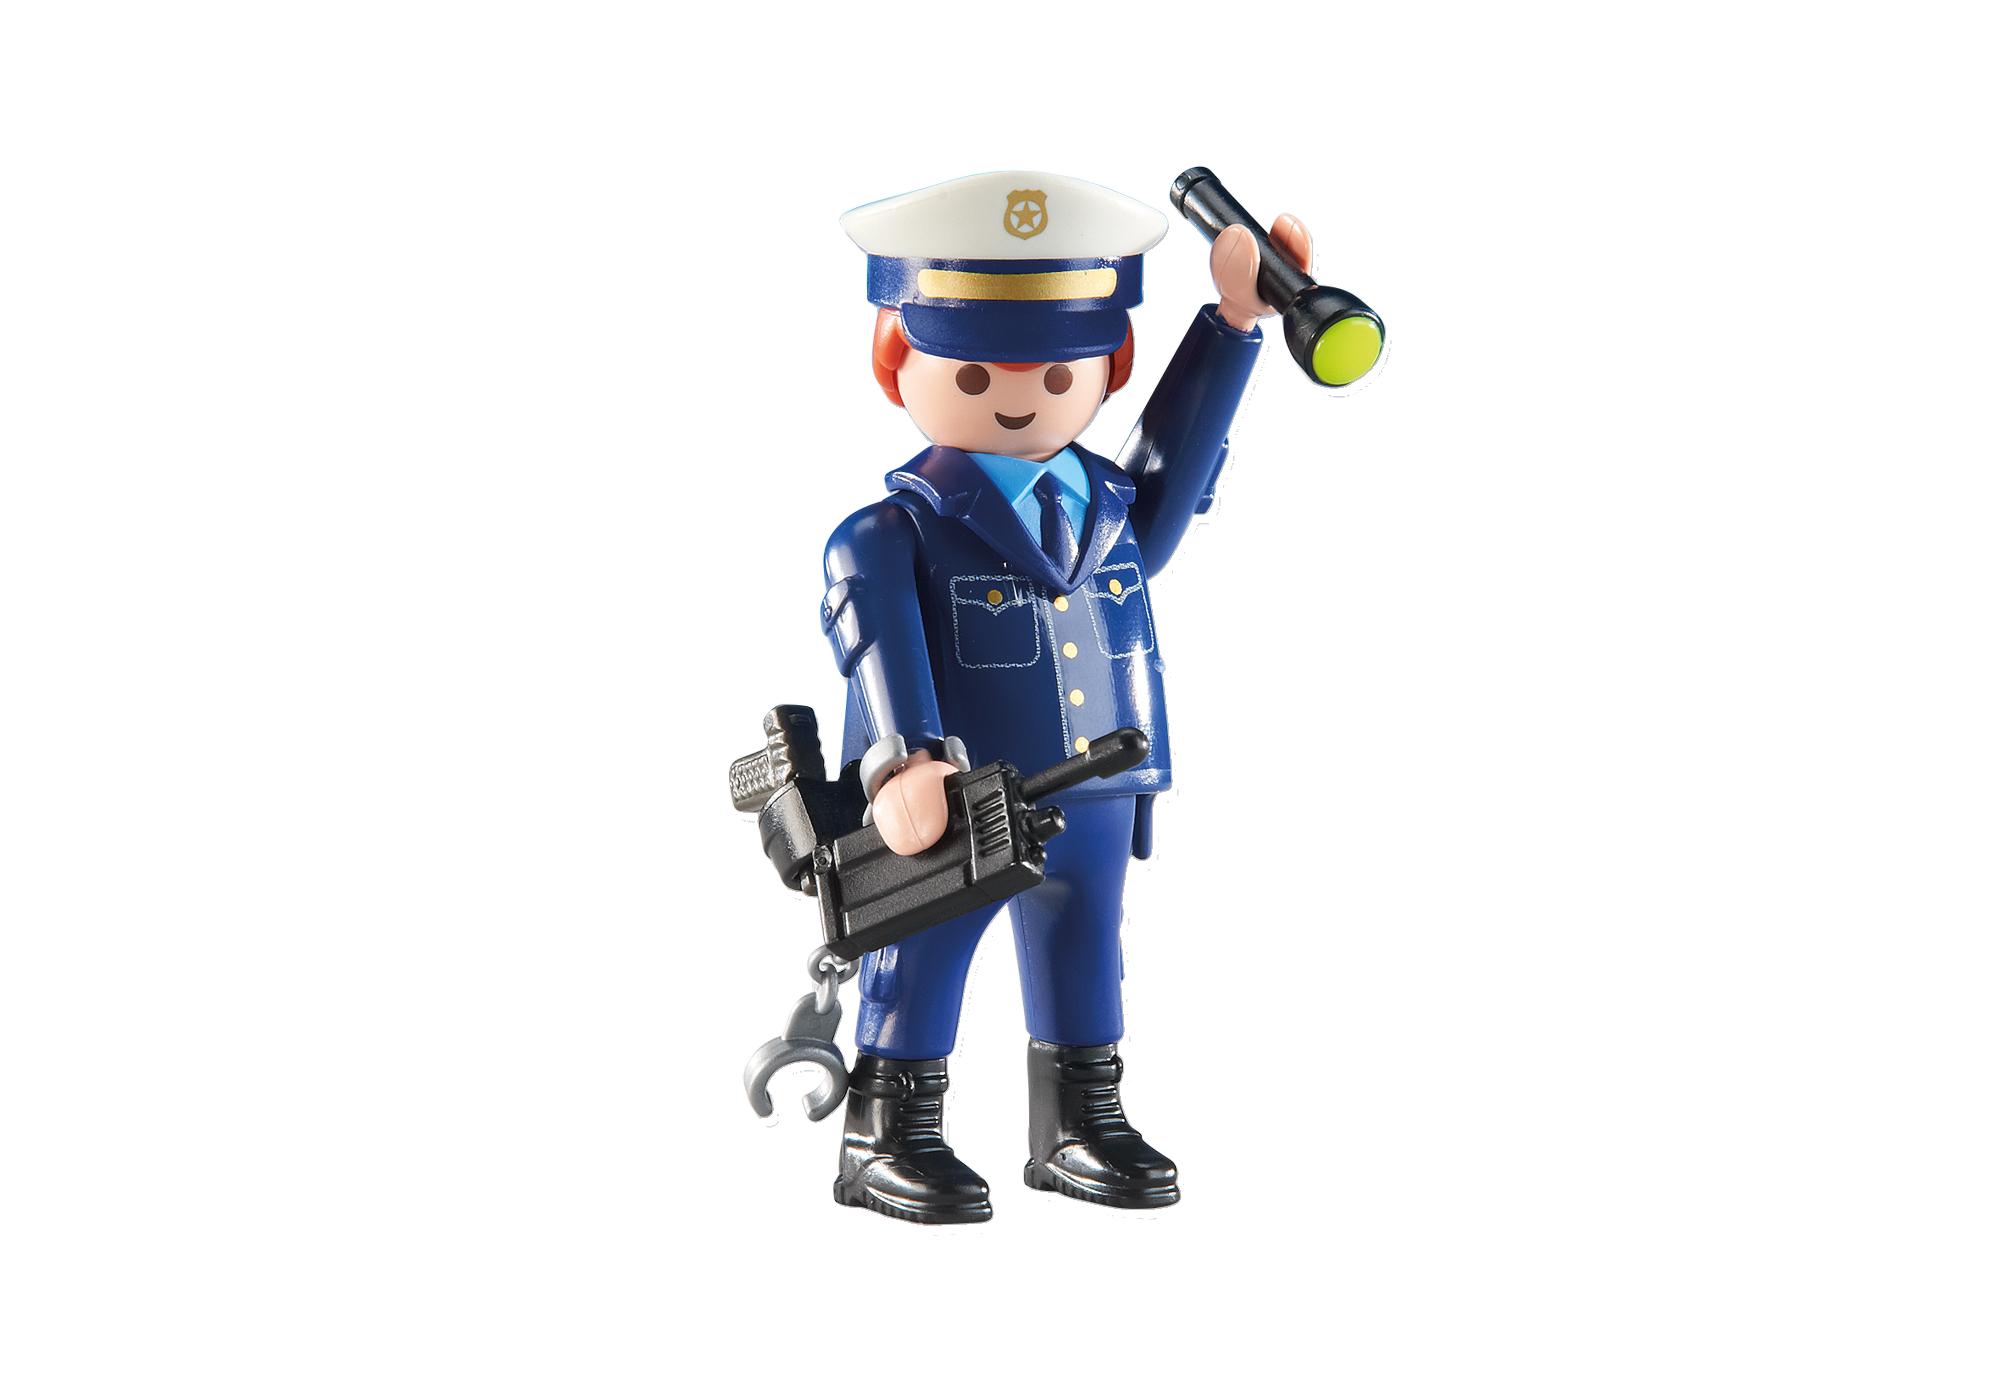 http://media.playmobil.com/i/playmobil/6502_product_detail/Jefe Policía